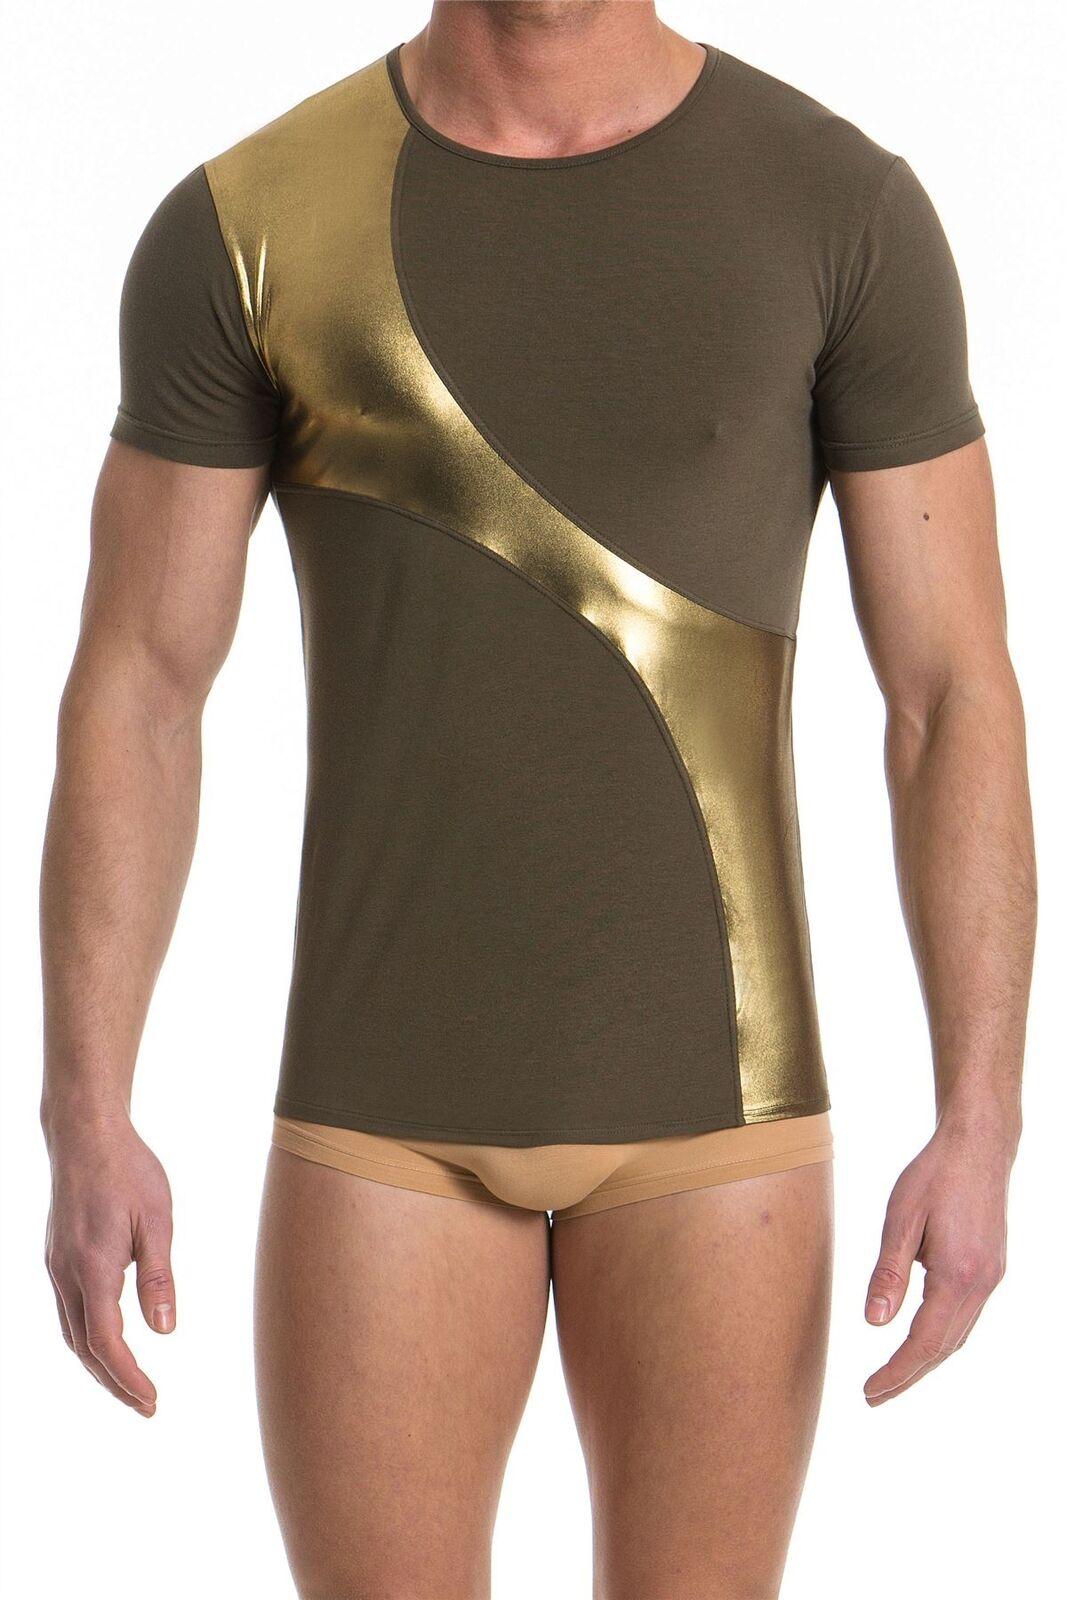 Modus Vivendi Dusk 2 Dawn T-Shirt Designer Shiney Gold Soft Comfortable